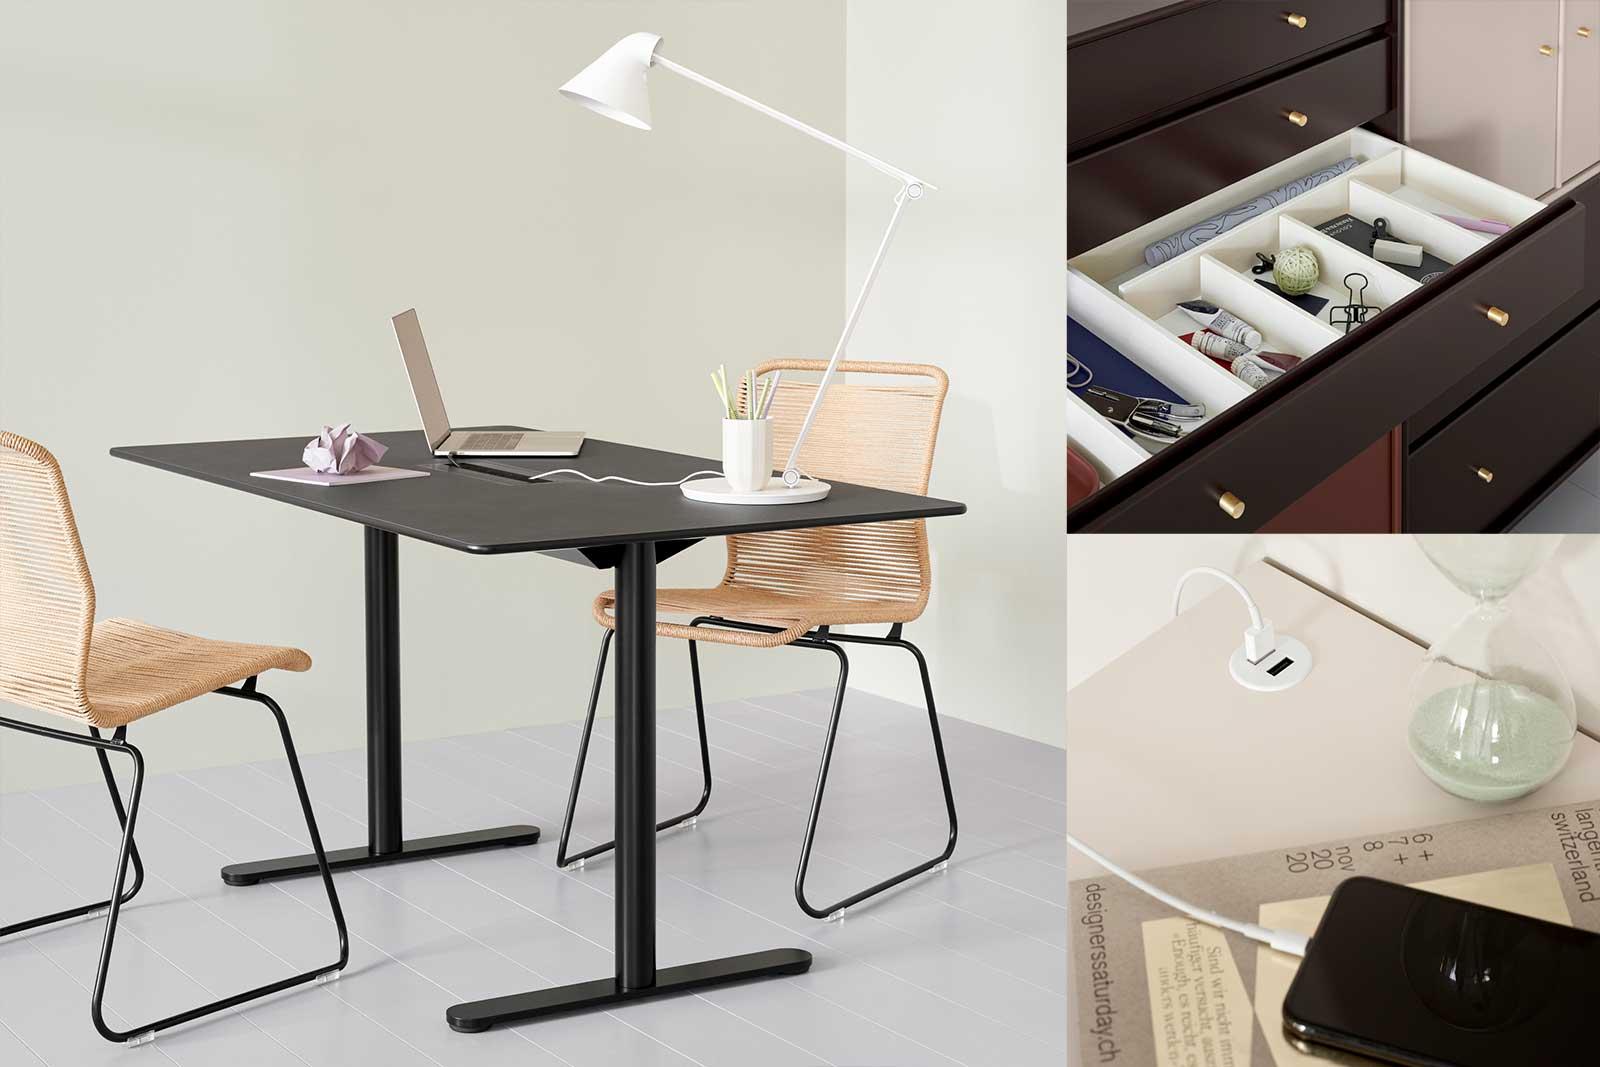 Montana Home Office Inspirationen, Boutique Danoise Basel Daenische Designer Moebel Accessoires Wohnen News